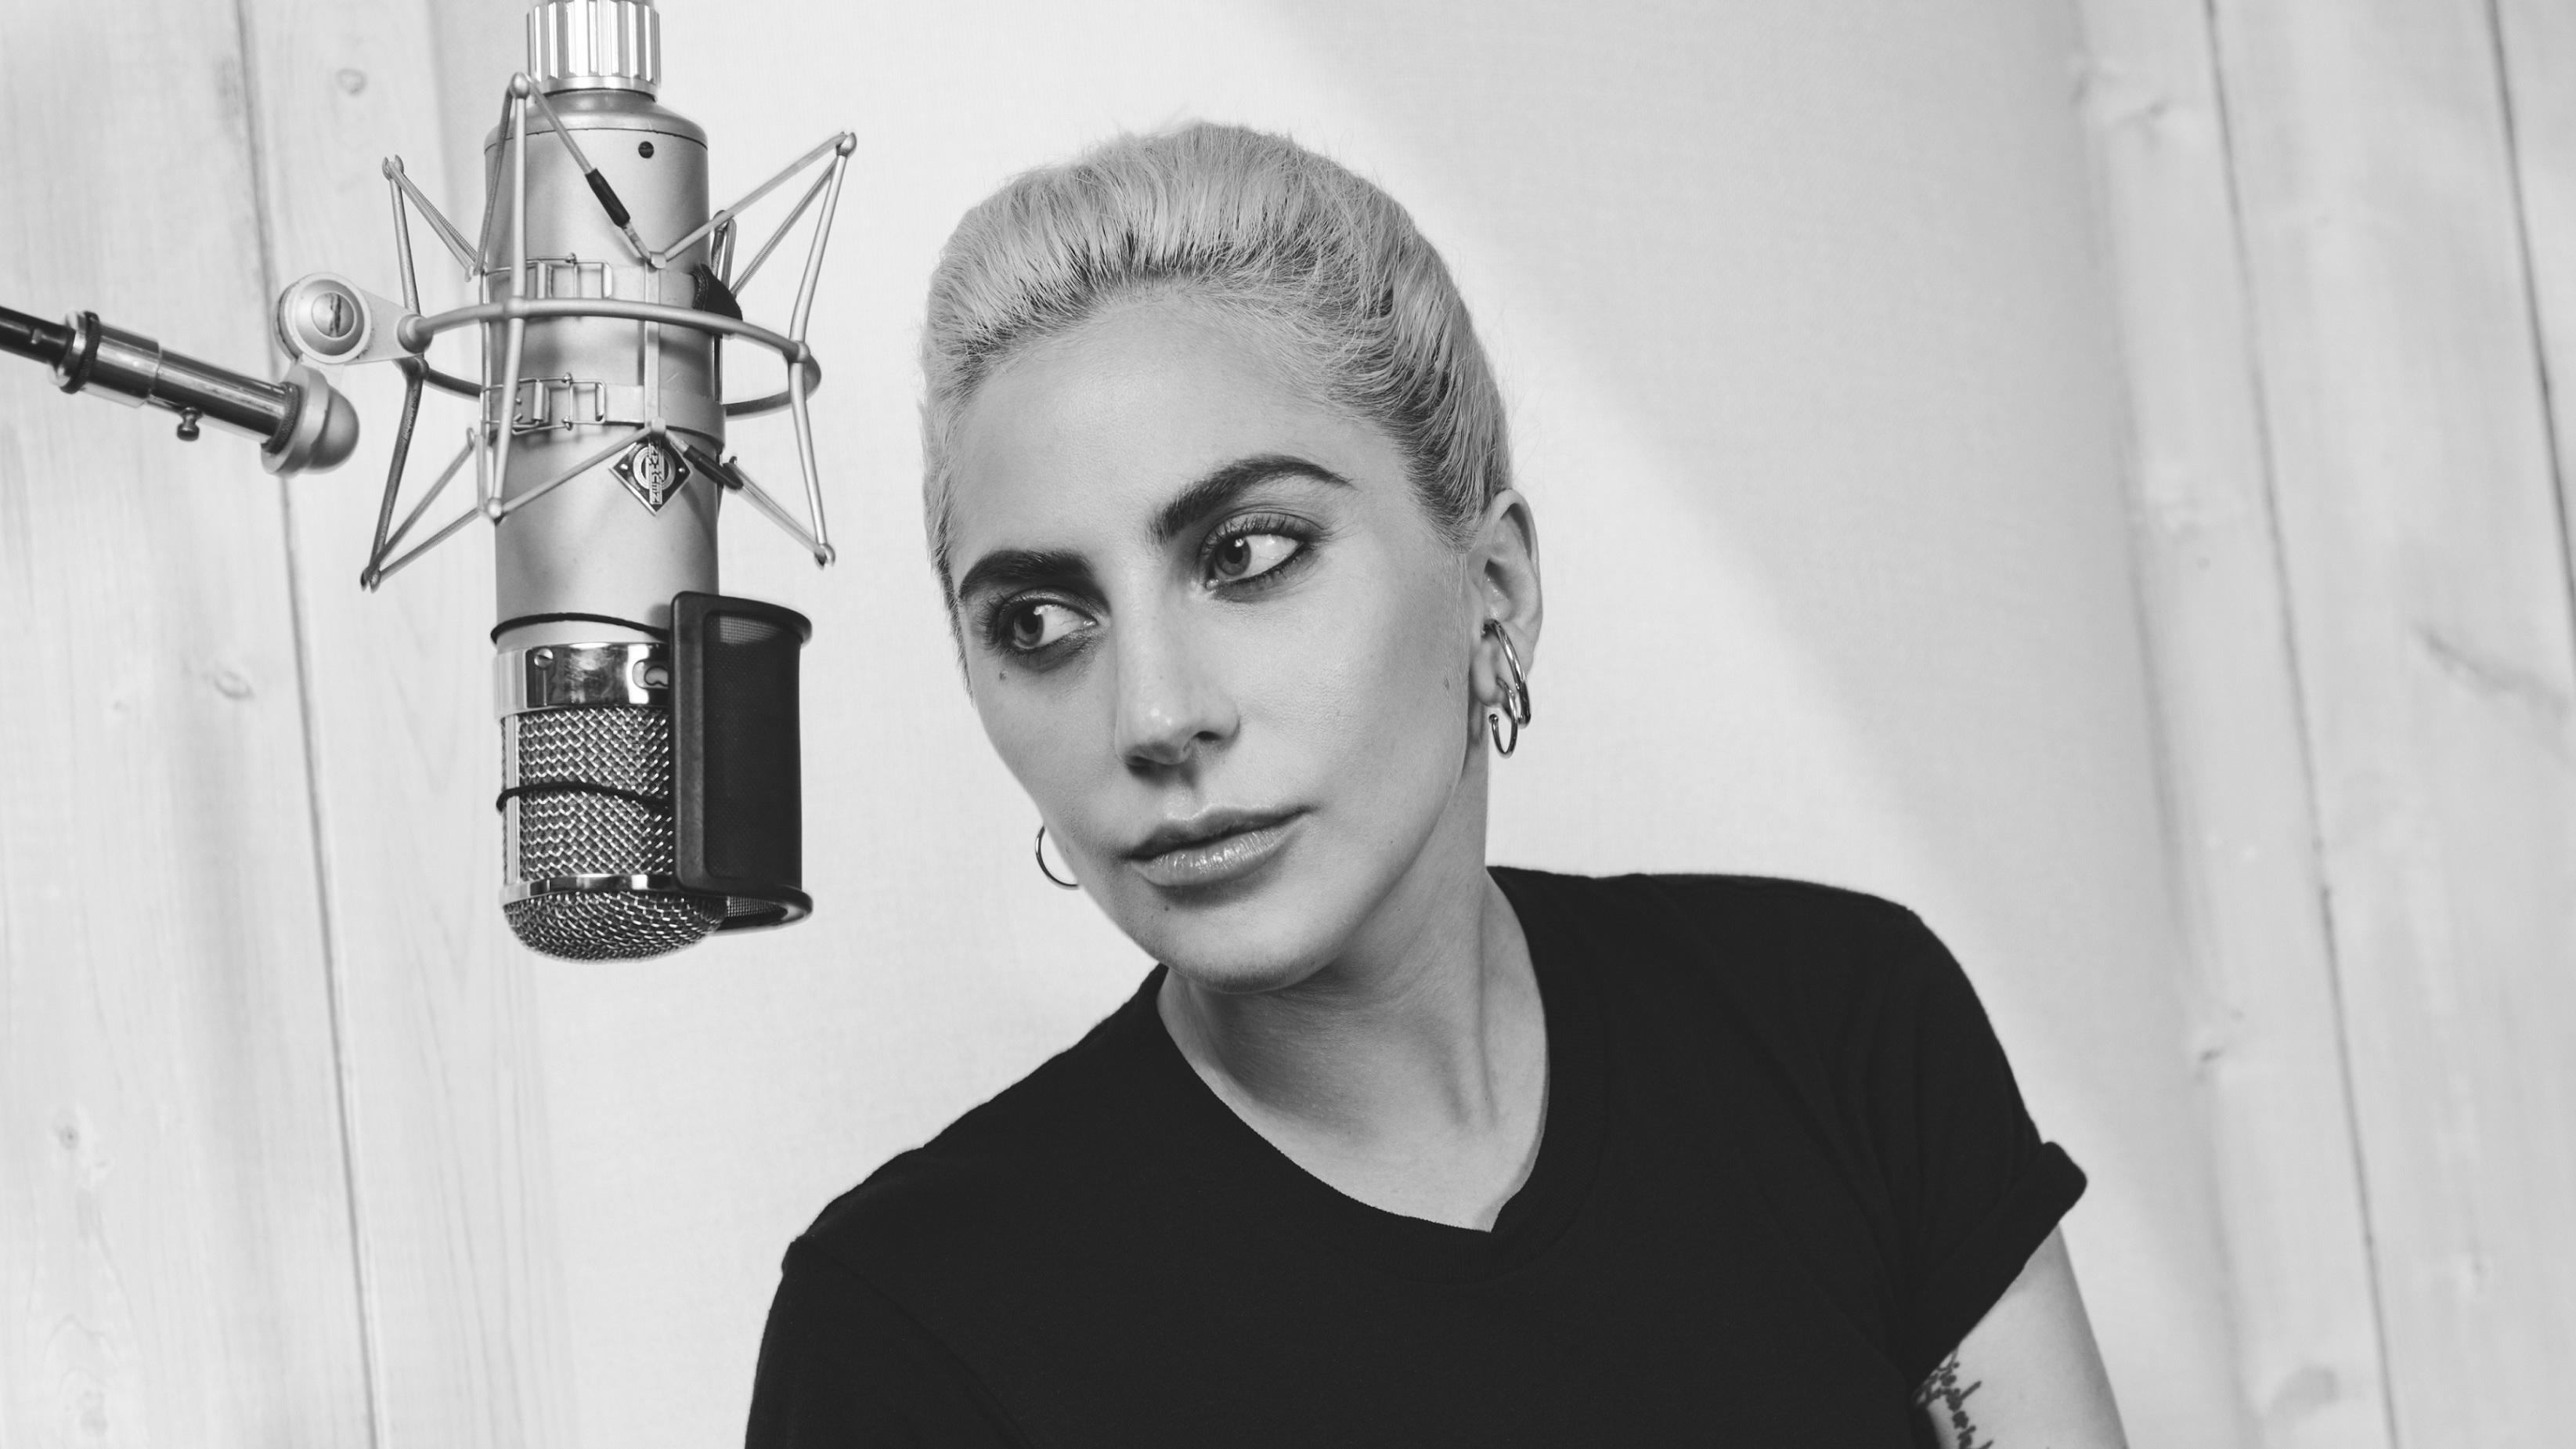 Lady Gaga will record a track with David Guetta 04.09.2009 46